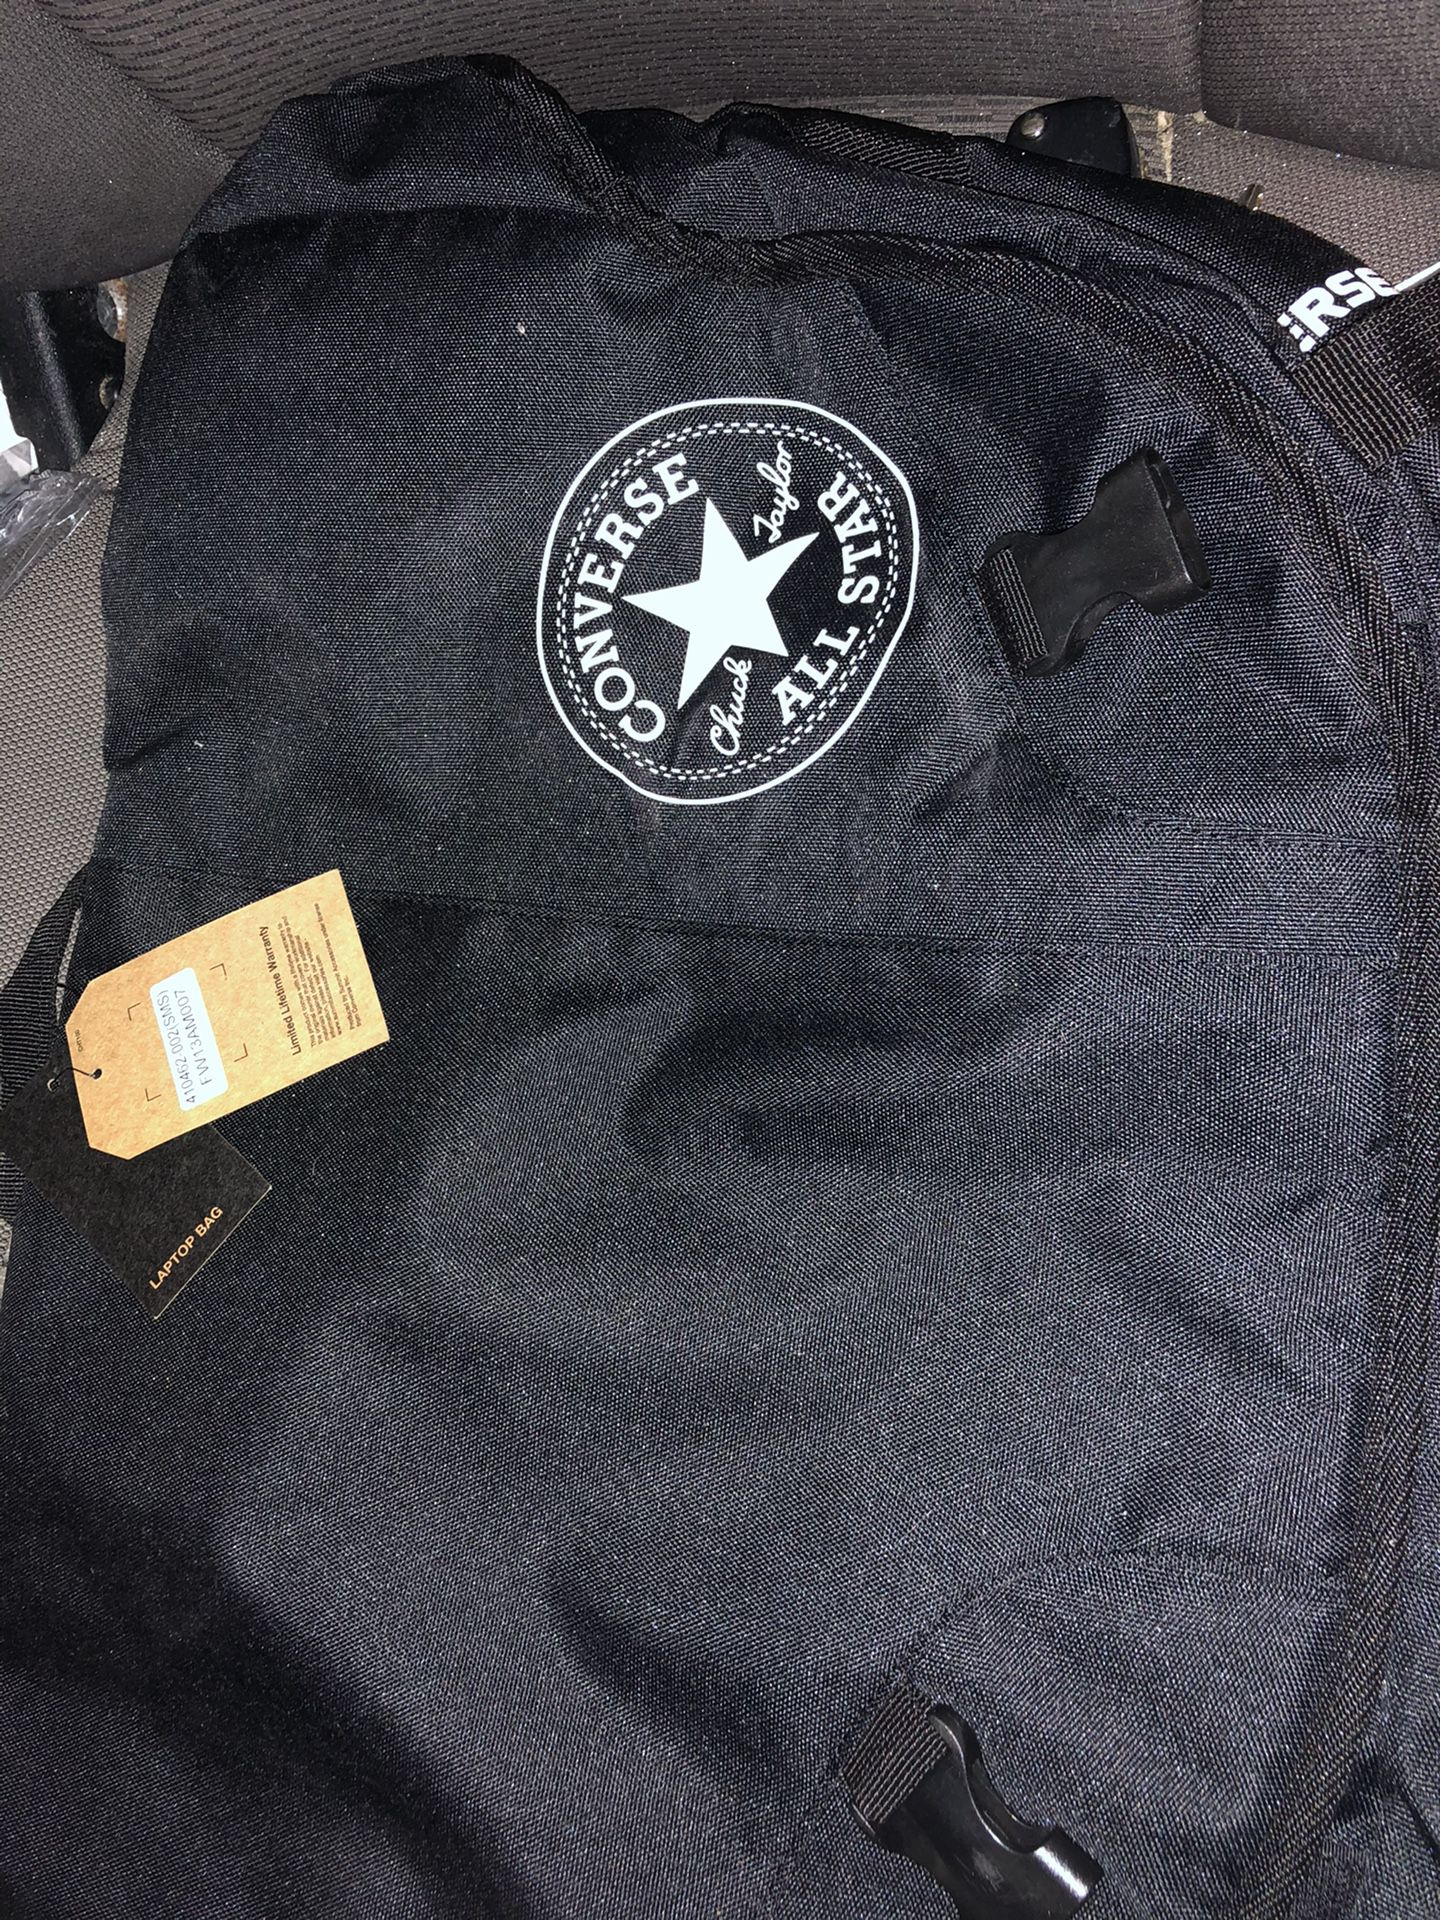 Brand new converse bag